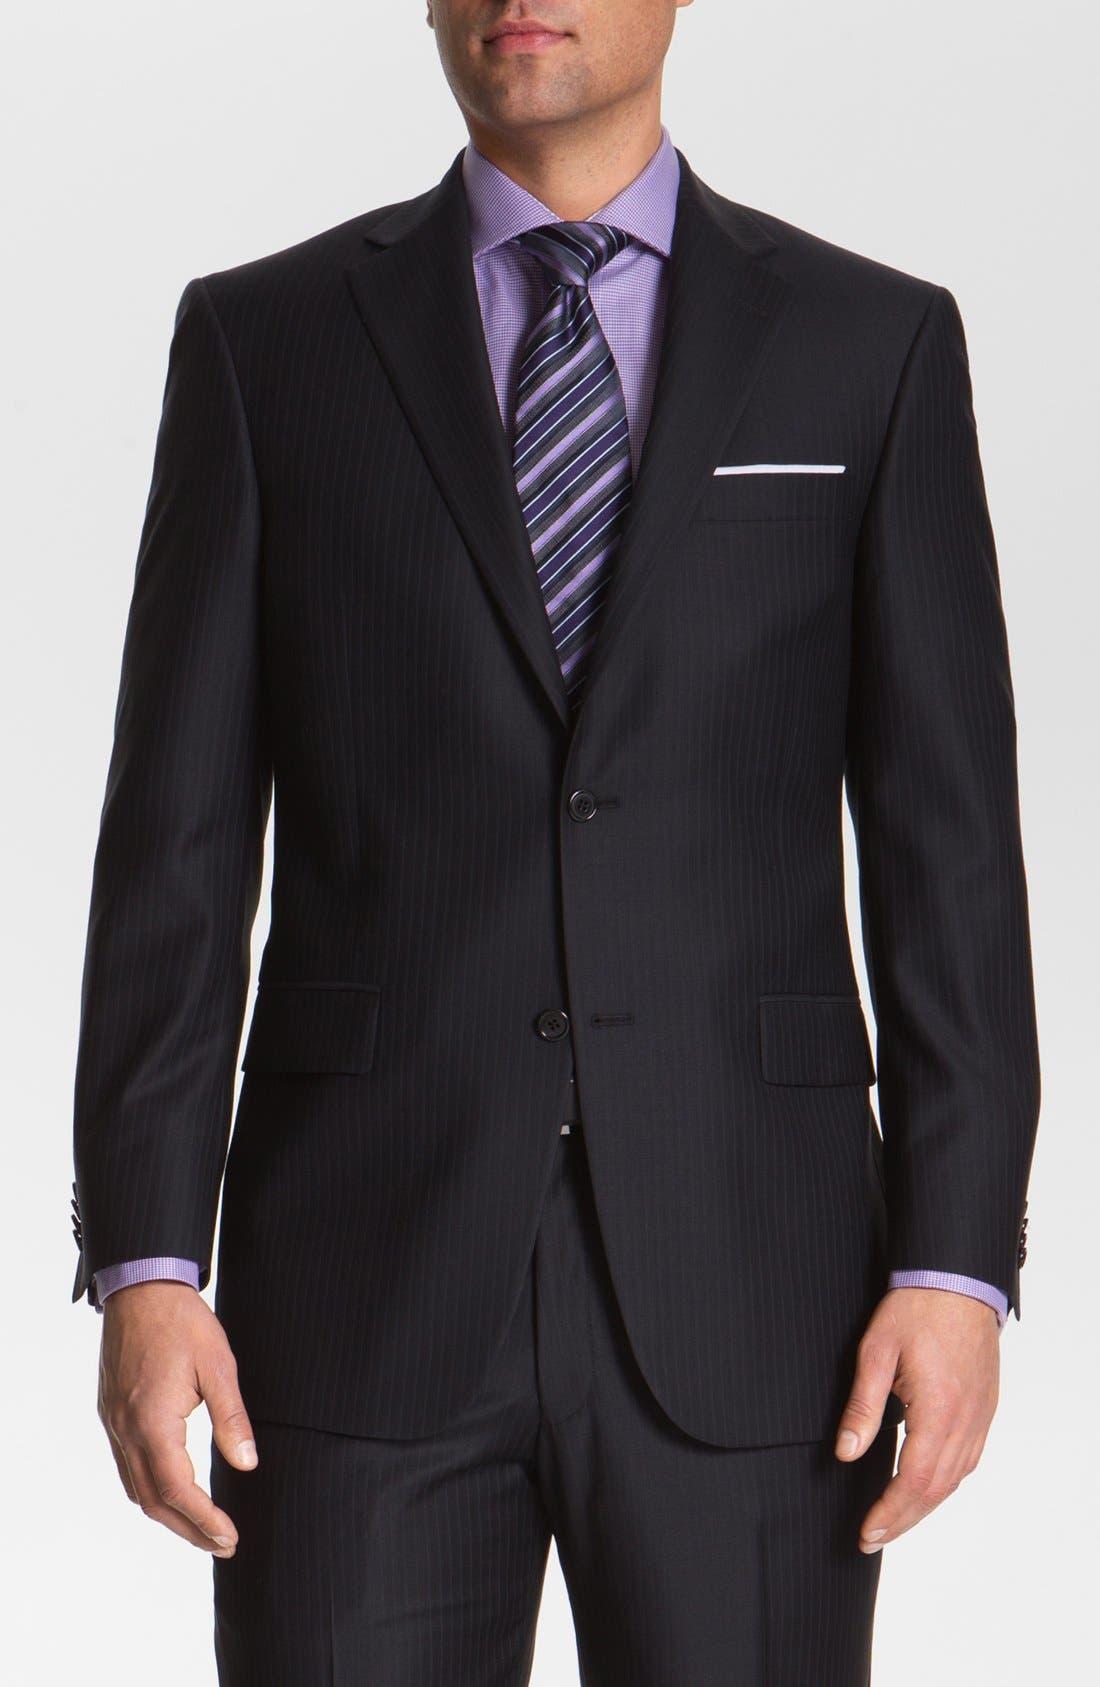 Alternate Image 1 Selected - Hart Schaffner Marx Stripe Wool Suit (Big)